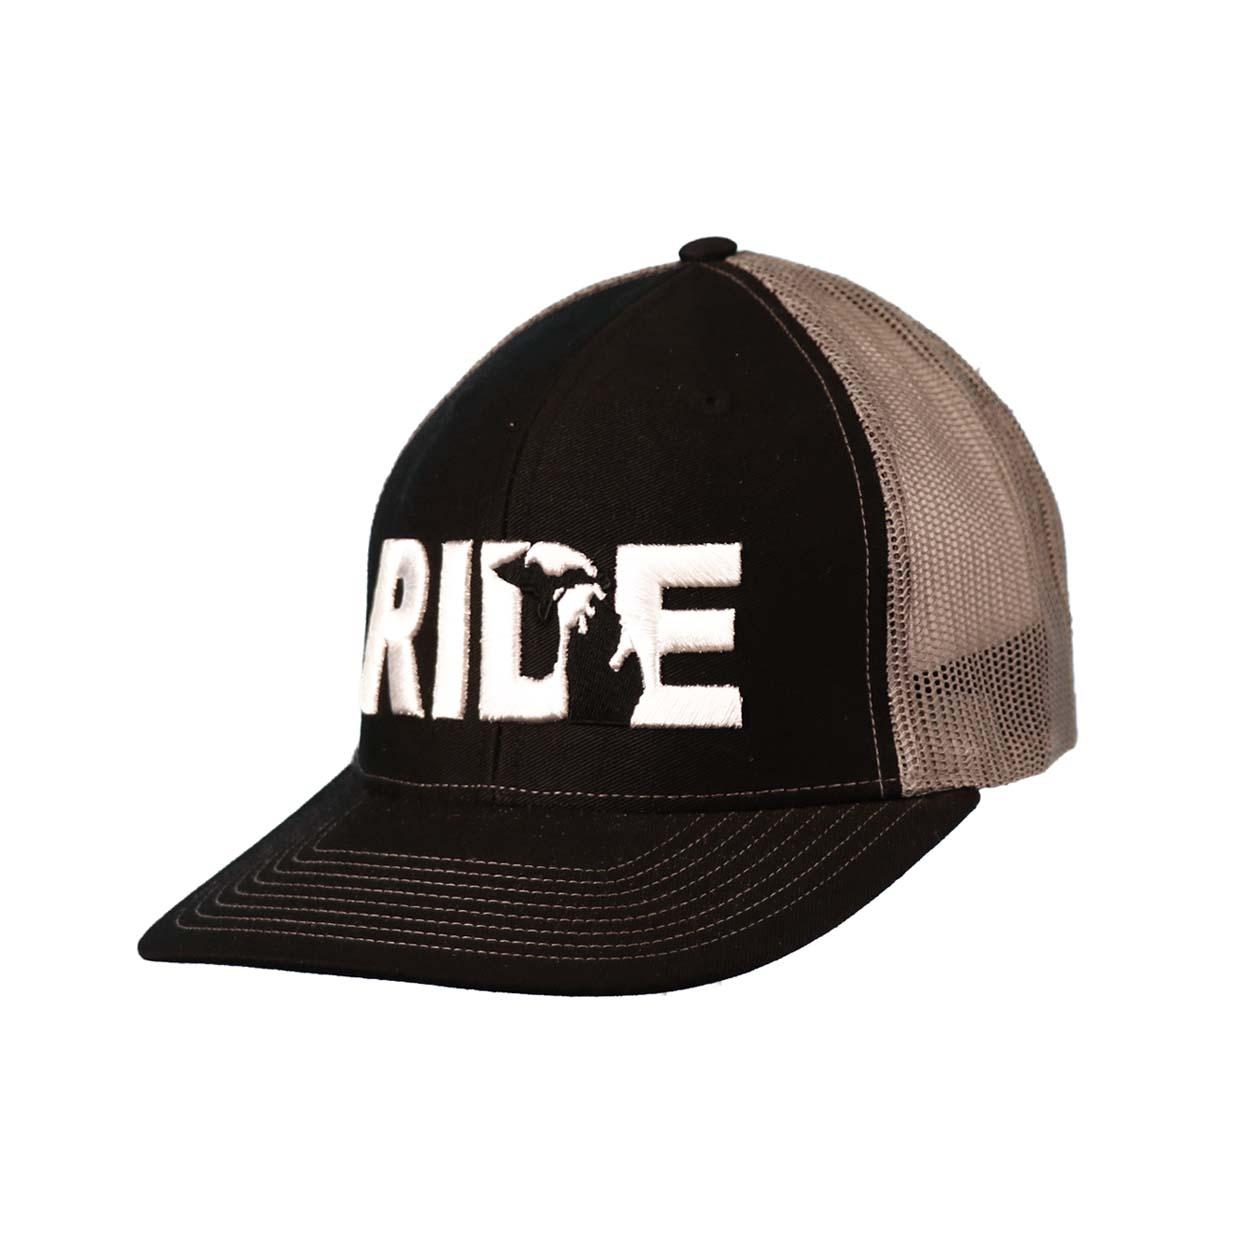 Ride Michigan Classic Embroidered Snapback Trucker Hat Black/White